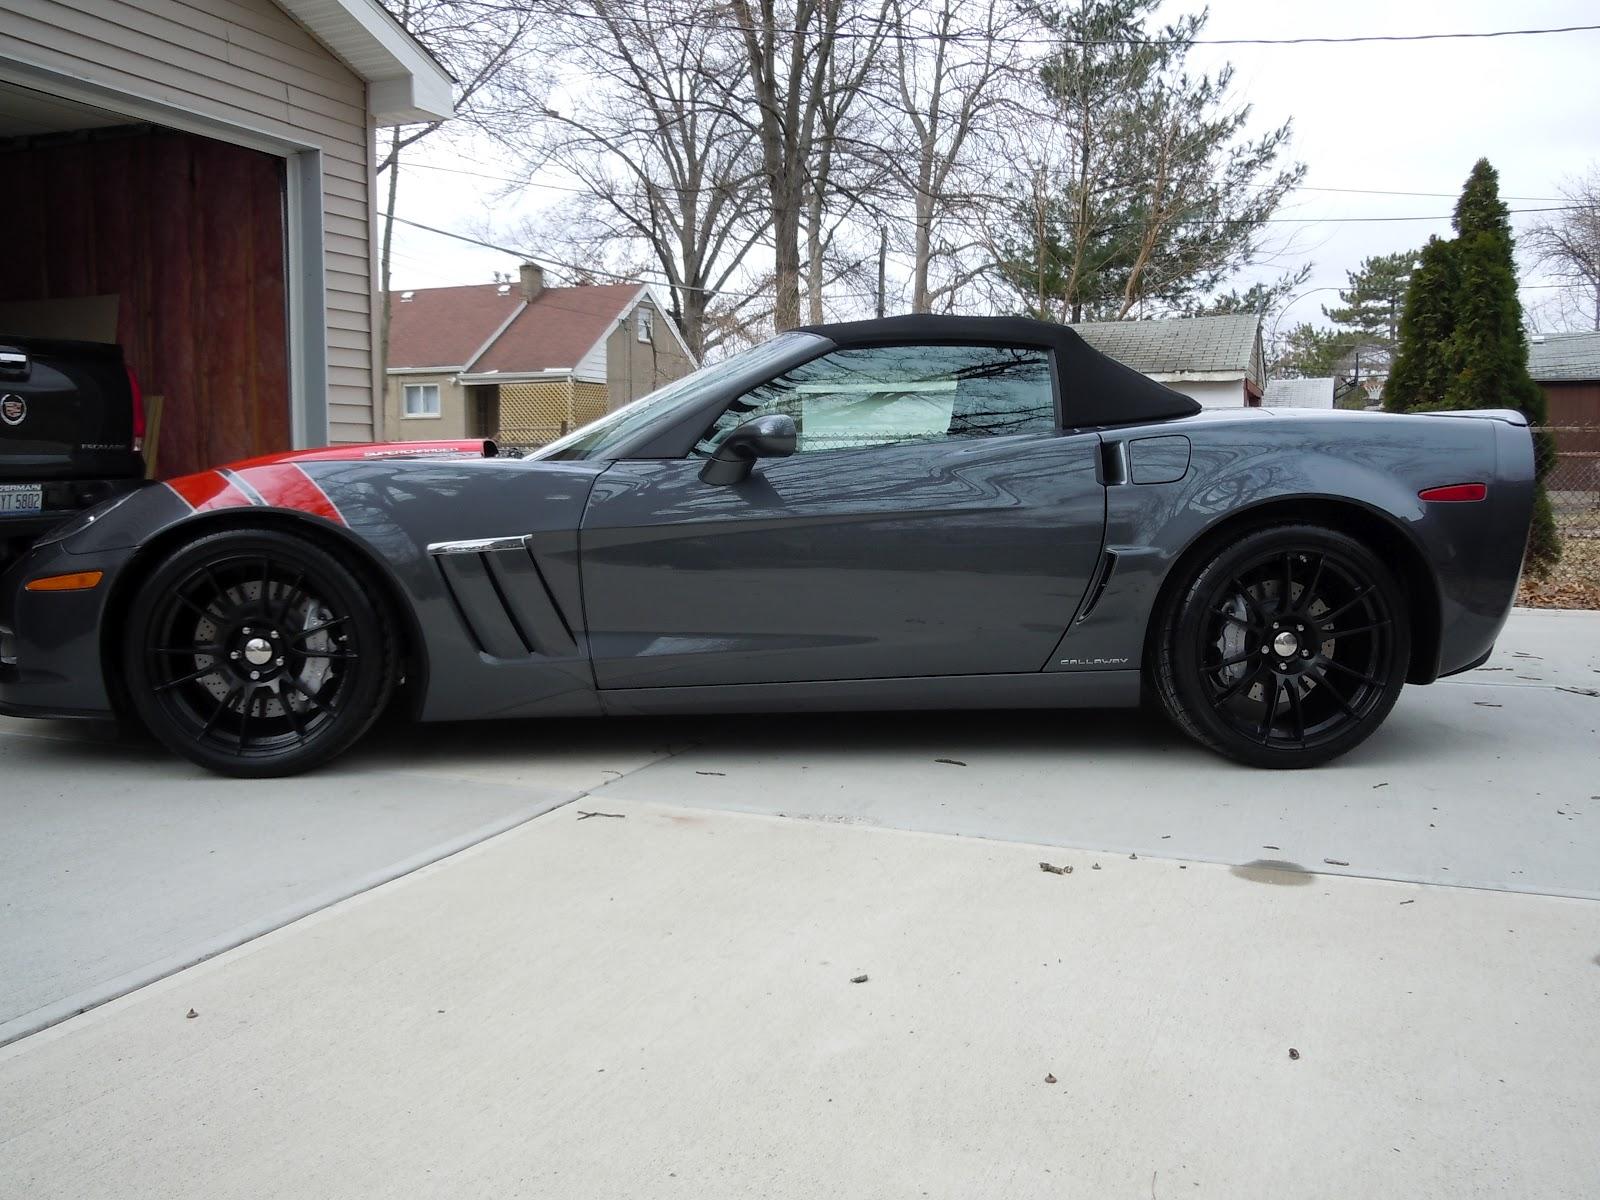 2011 Callaway Sc606 Grand Sport Convertible 1200 Miles